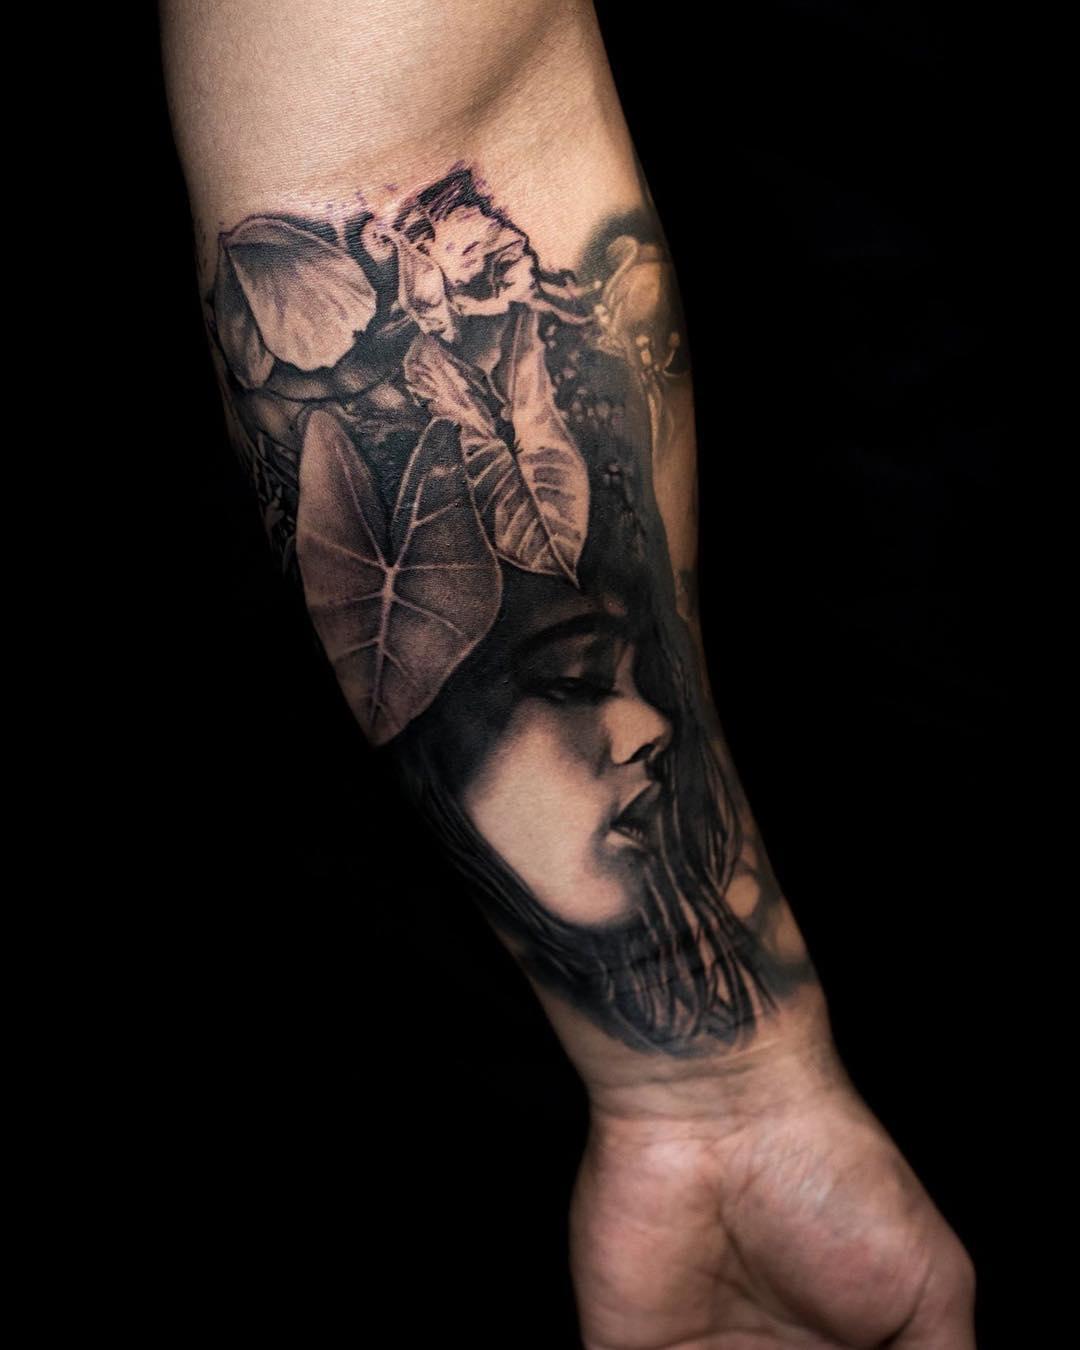 bacanu-bogdan-tatoueur-corsair-tattoo-ink-convention-tatouage-bretagne